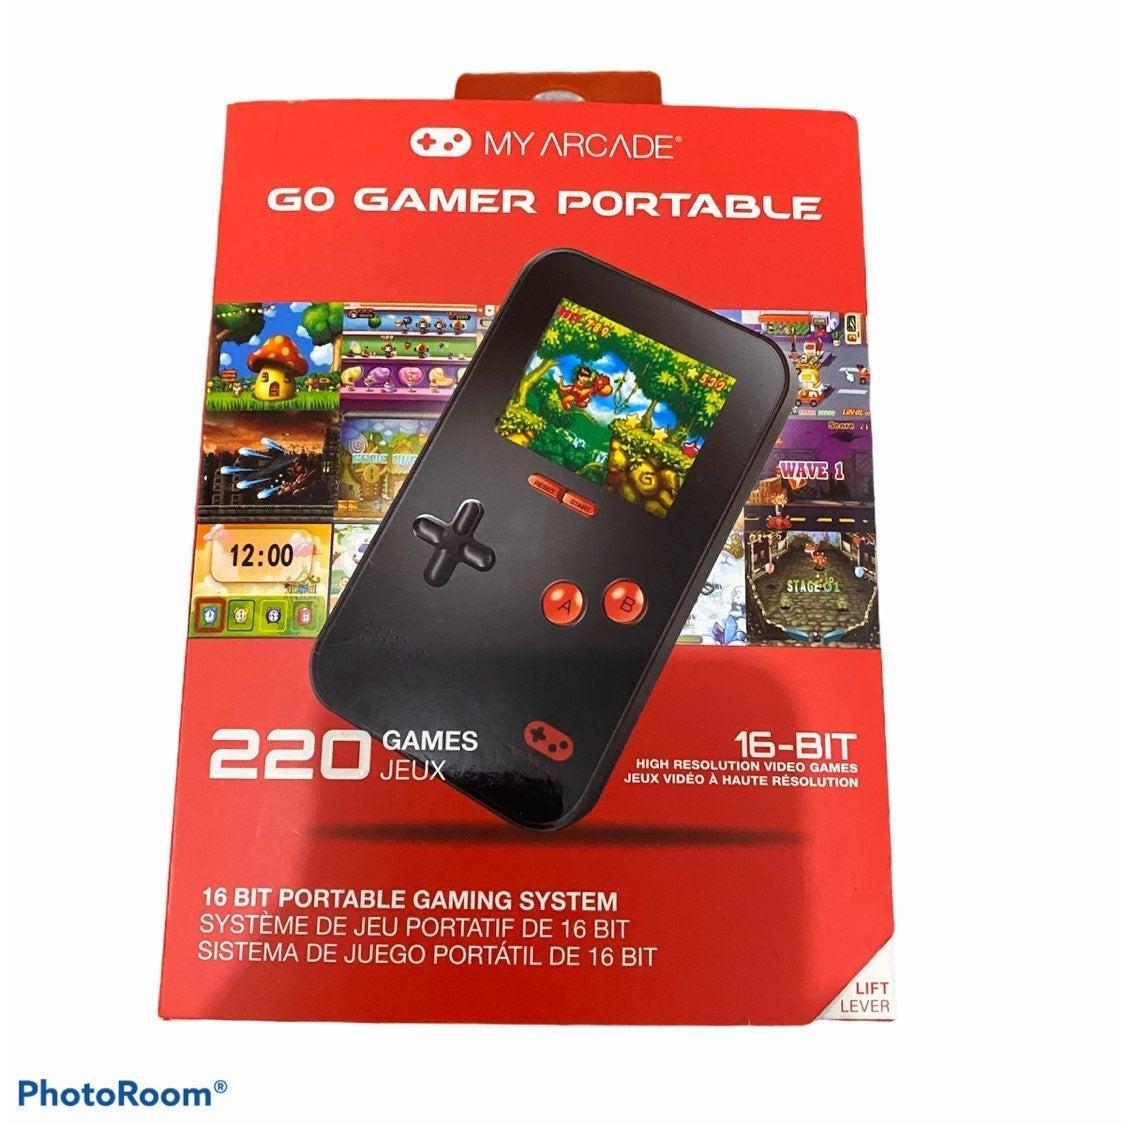 Go Gamer Portable Gaming System 220 Game